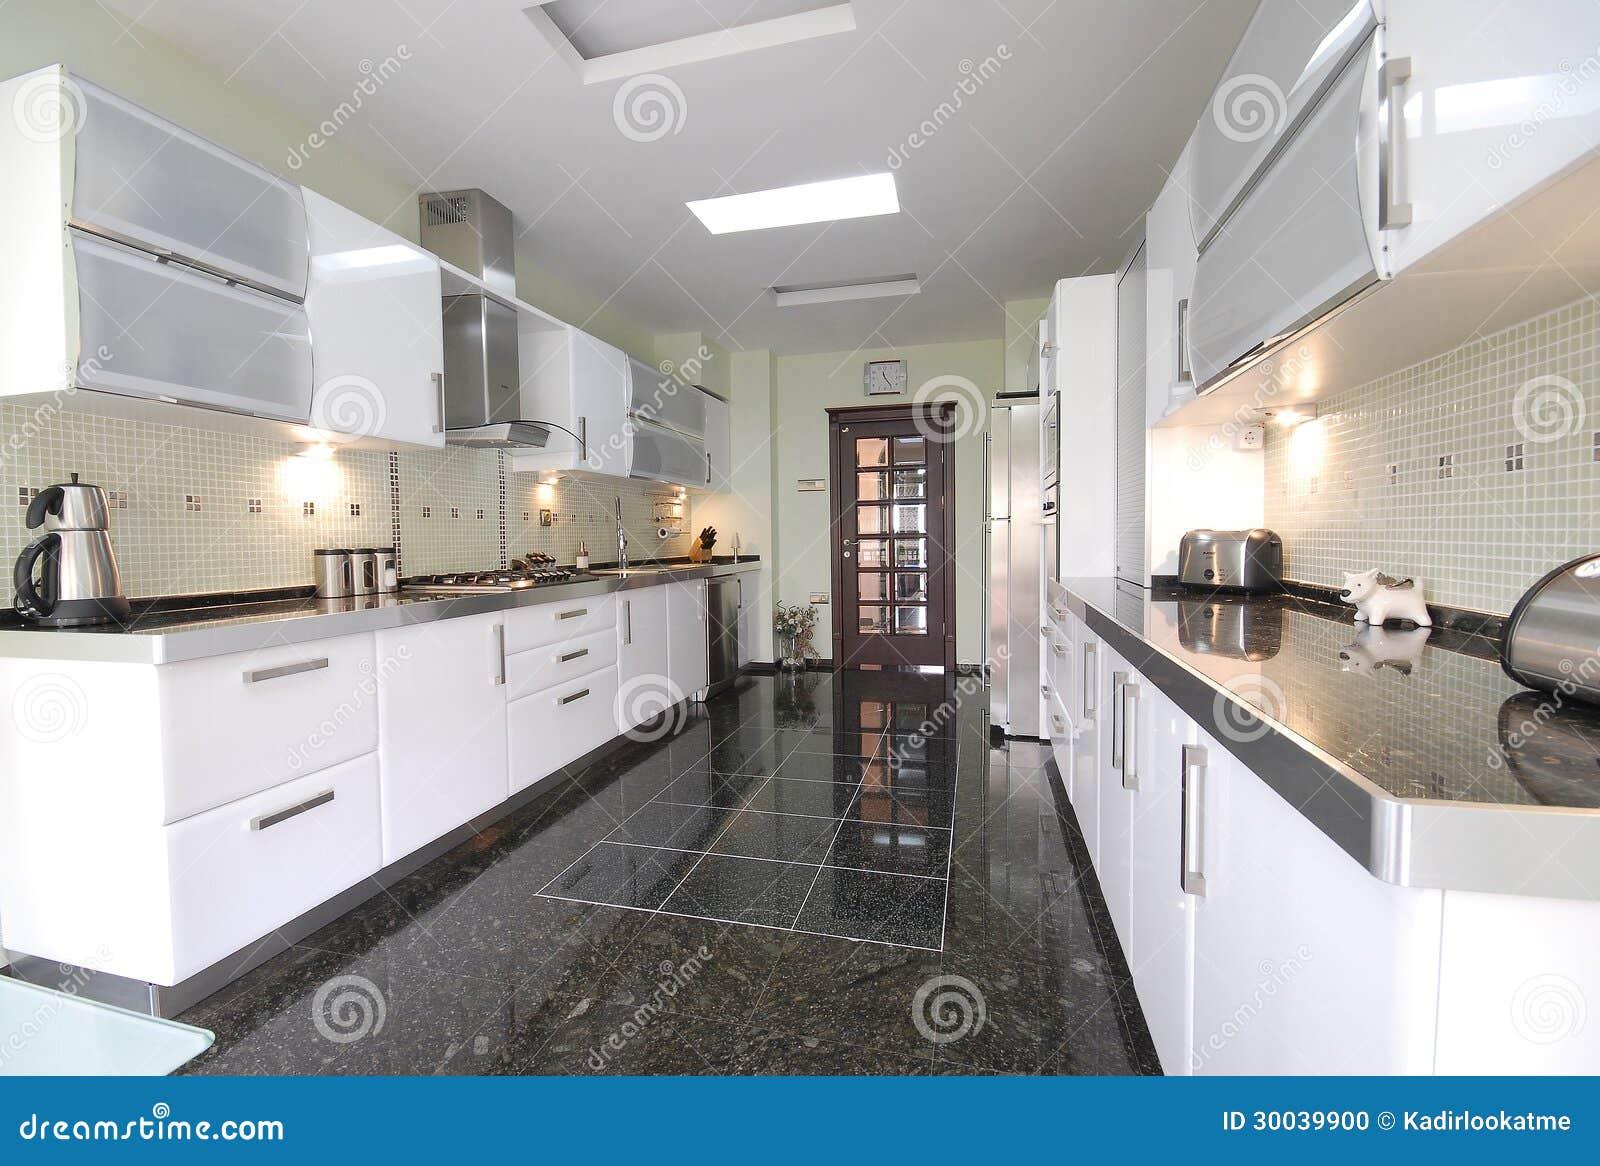 s ubern sie moderne k che stockfoto bild 30039900. Black Bedroom Furniture Sets. Home Design Ideas